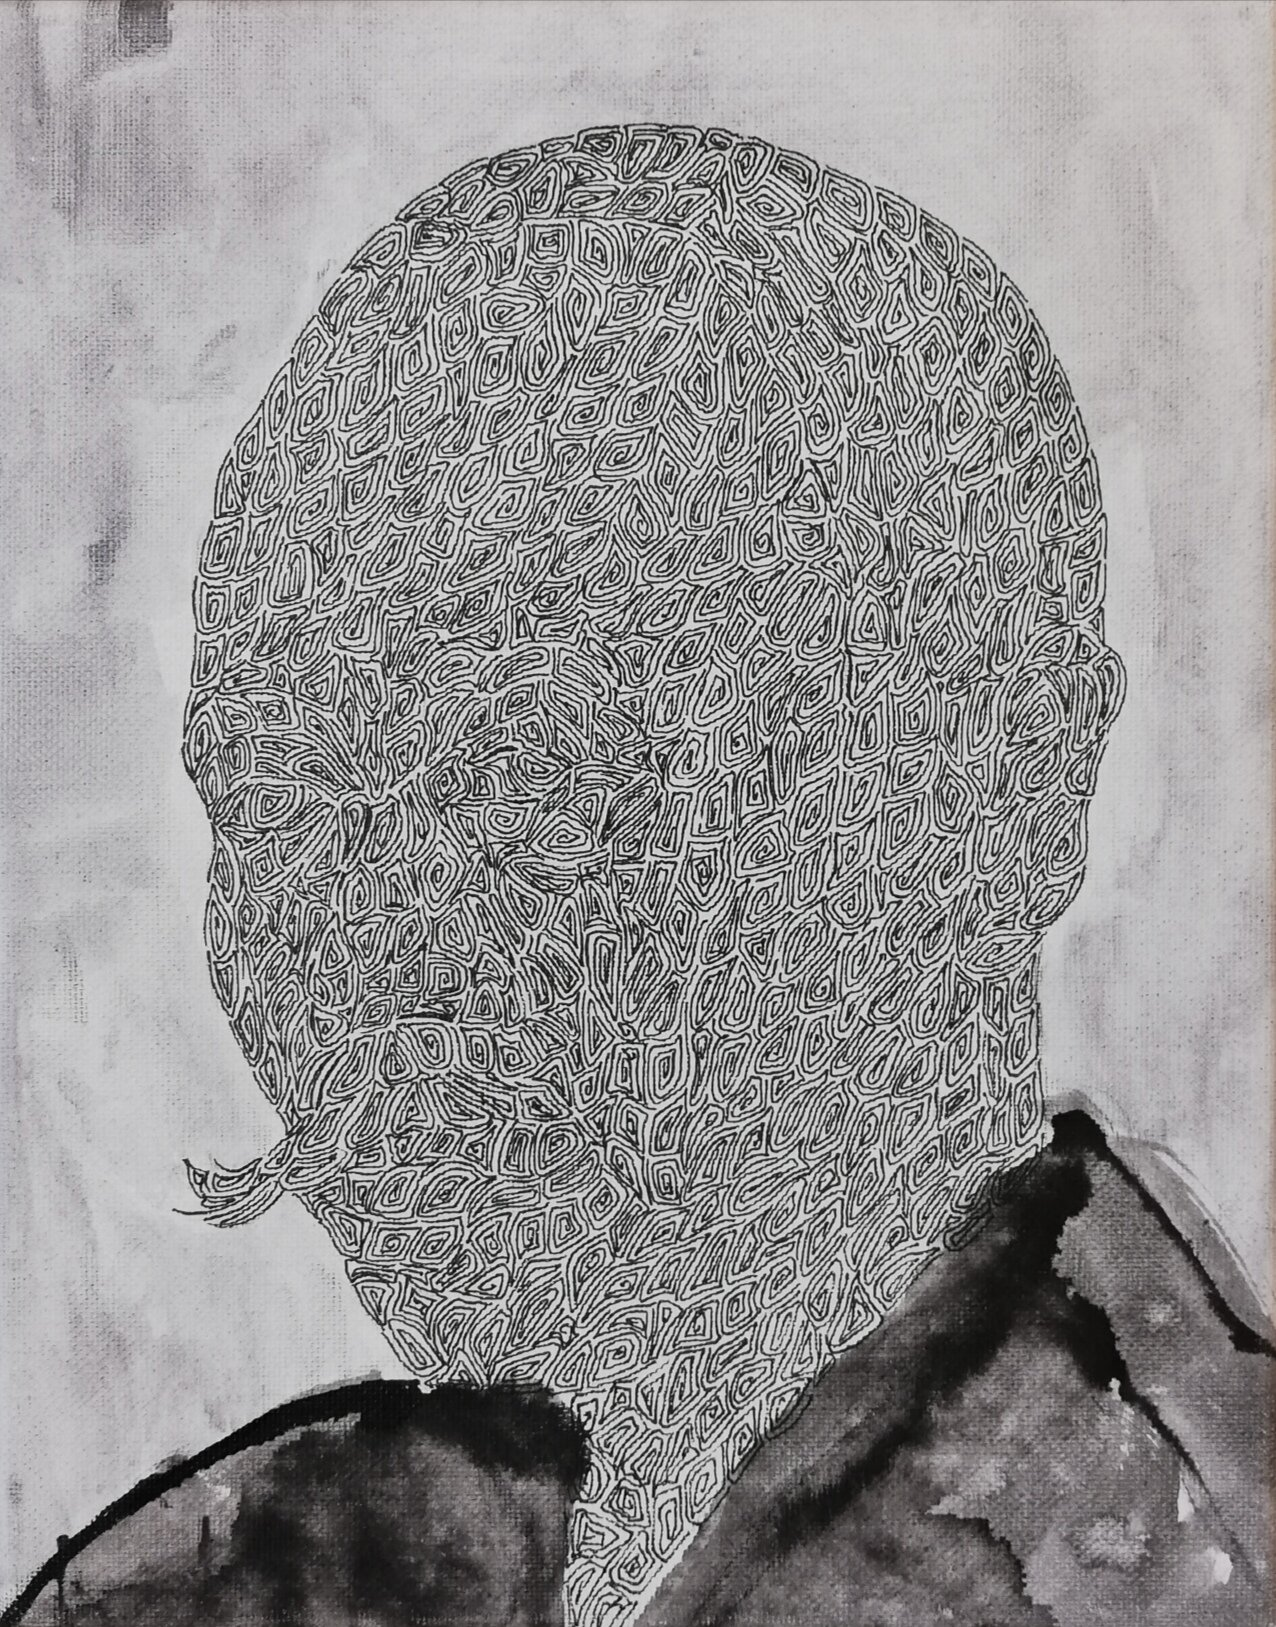 SANF058 Naoki Fuku_No Longer Human(Mori)_Ink, acrylic, watercolor and brush pen on canvas_18x24cm_2019.jpg